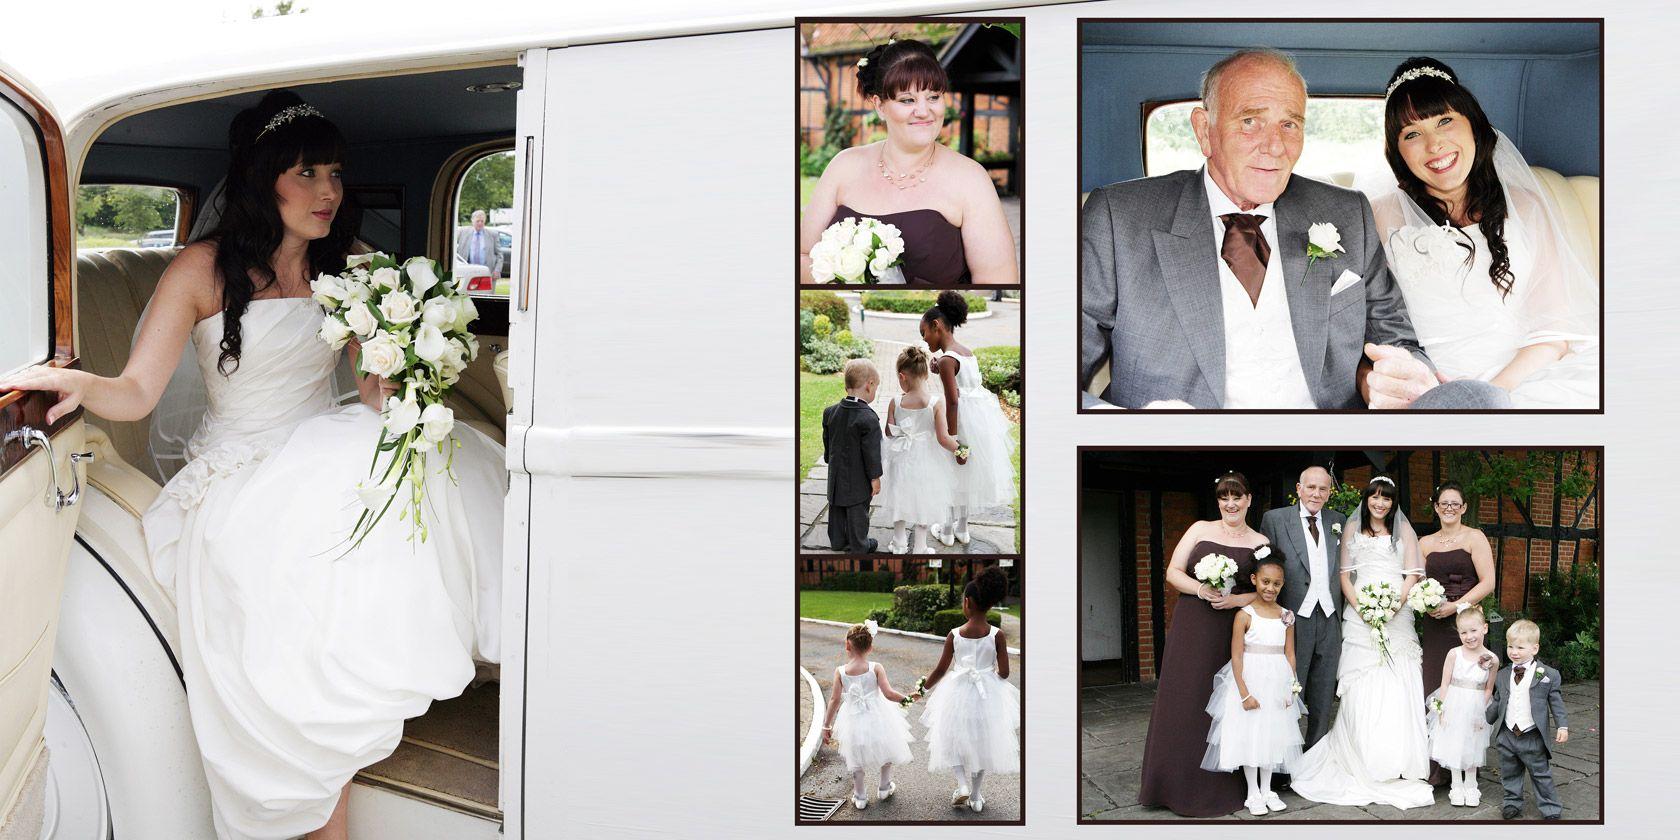 Professional Wedding Photo Albums Online Wedding Photo Books Albums Remembered Wedding Photo Books Wedding Photo Albums Wedding Album Design